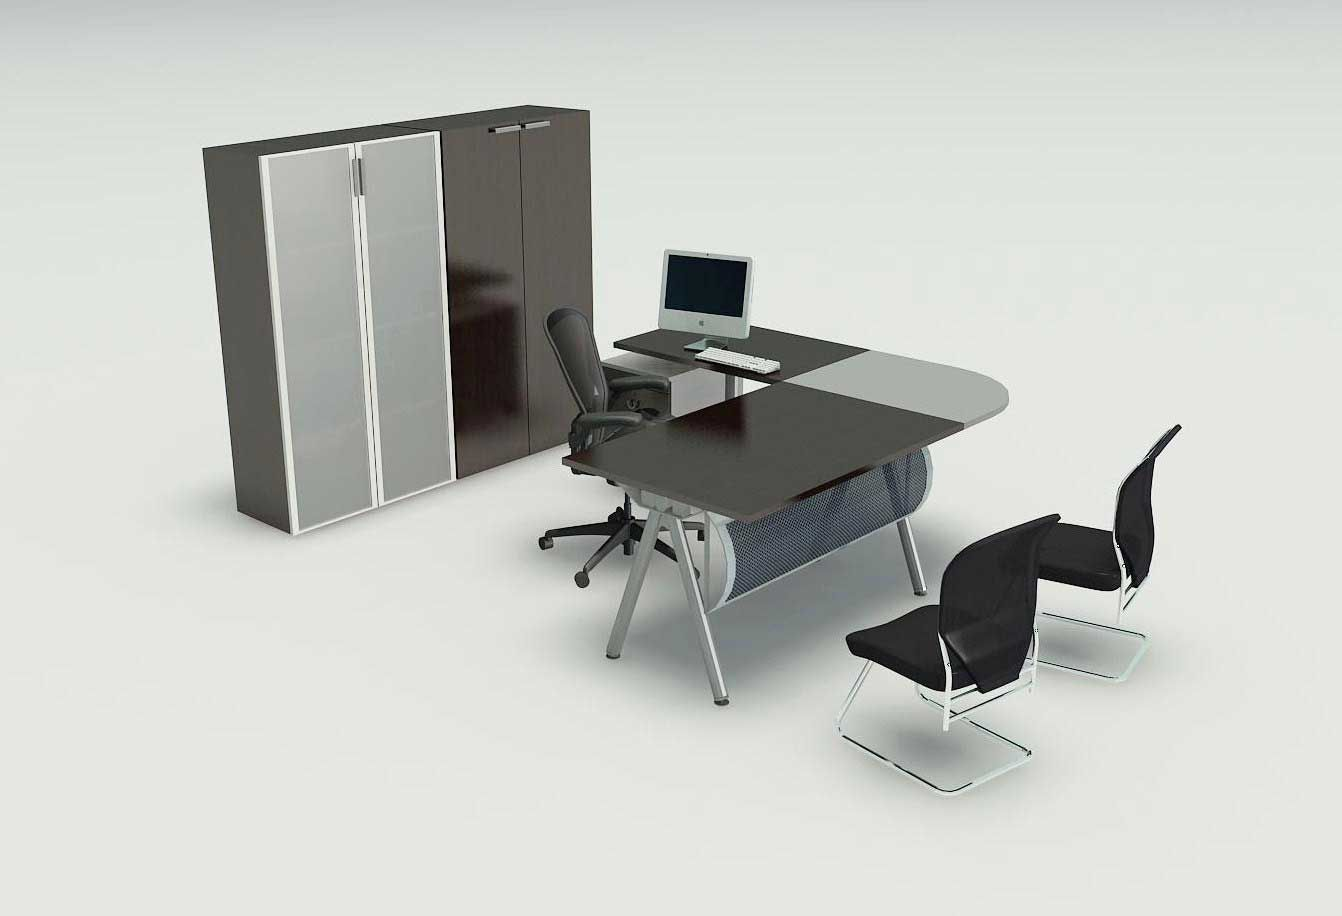 Ergonomic Office Furniture Would Provide Relaxed Environment In Any Office Ergonomic Office Furniture Home Office Furniture Design Office Furniture